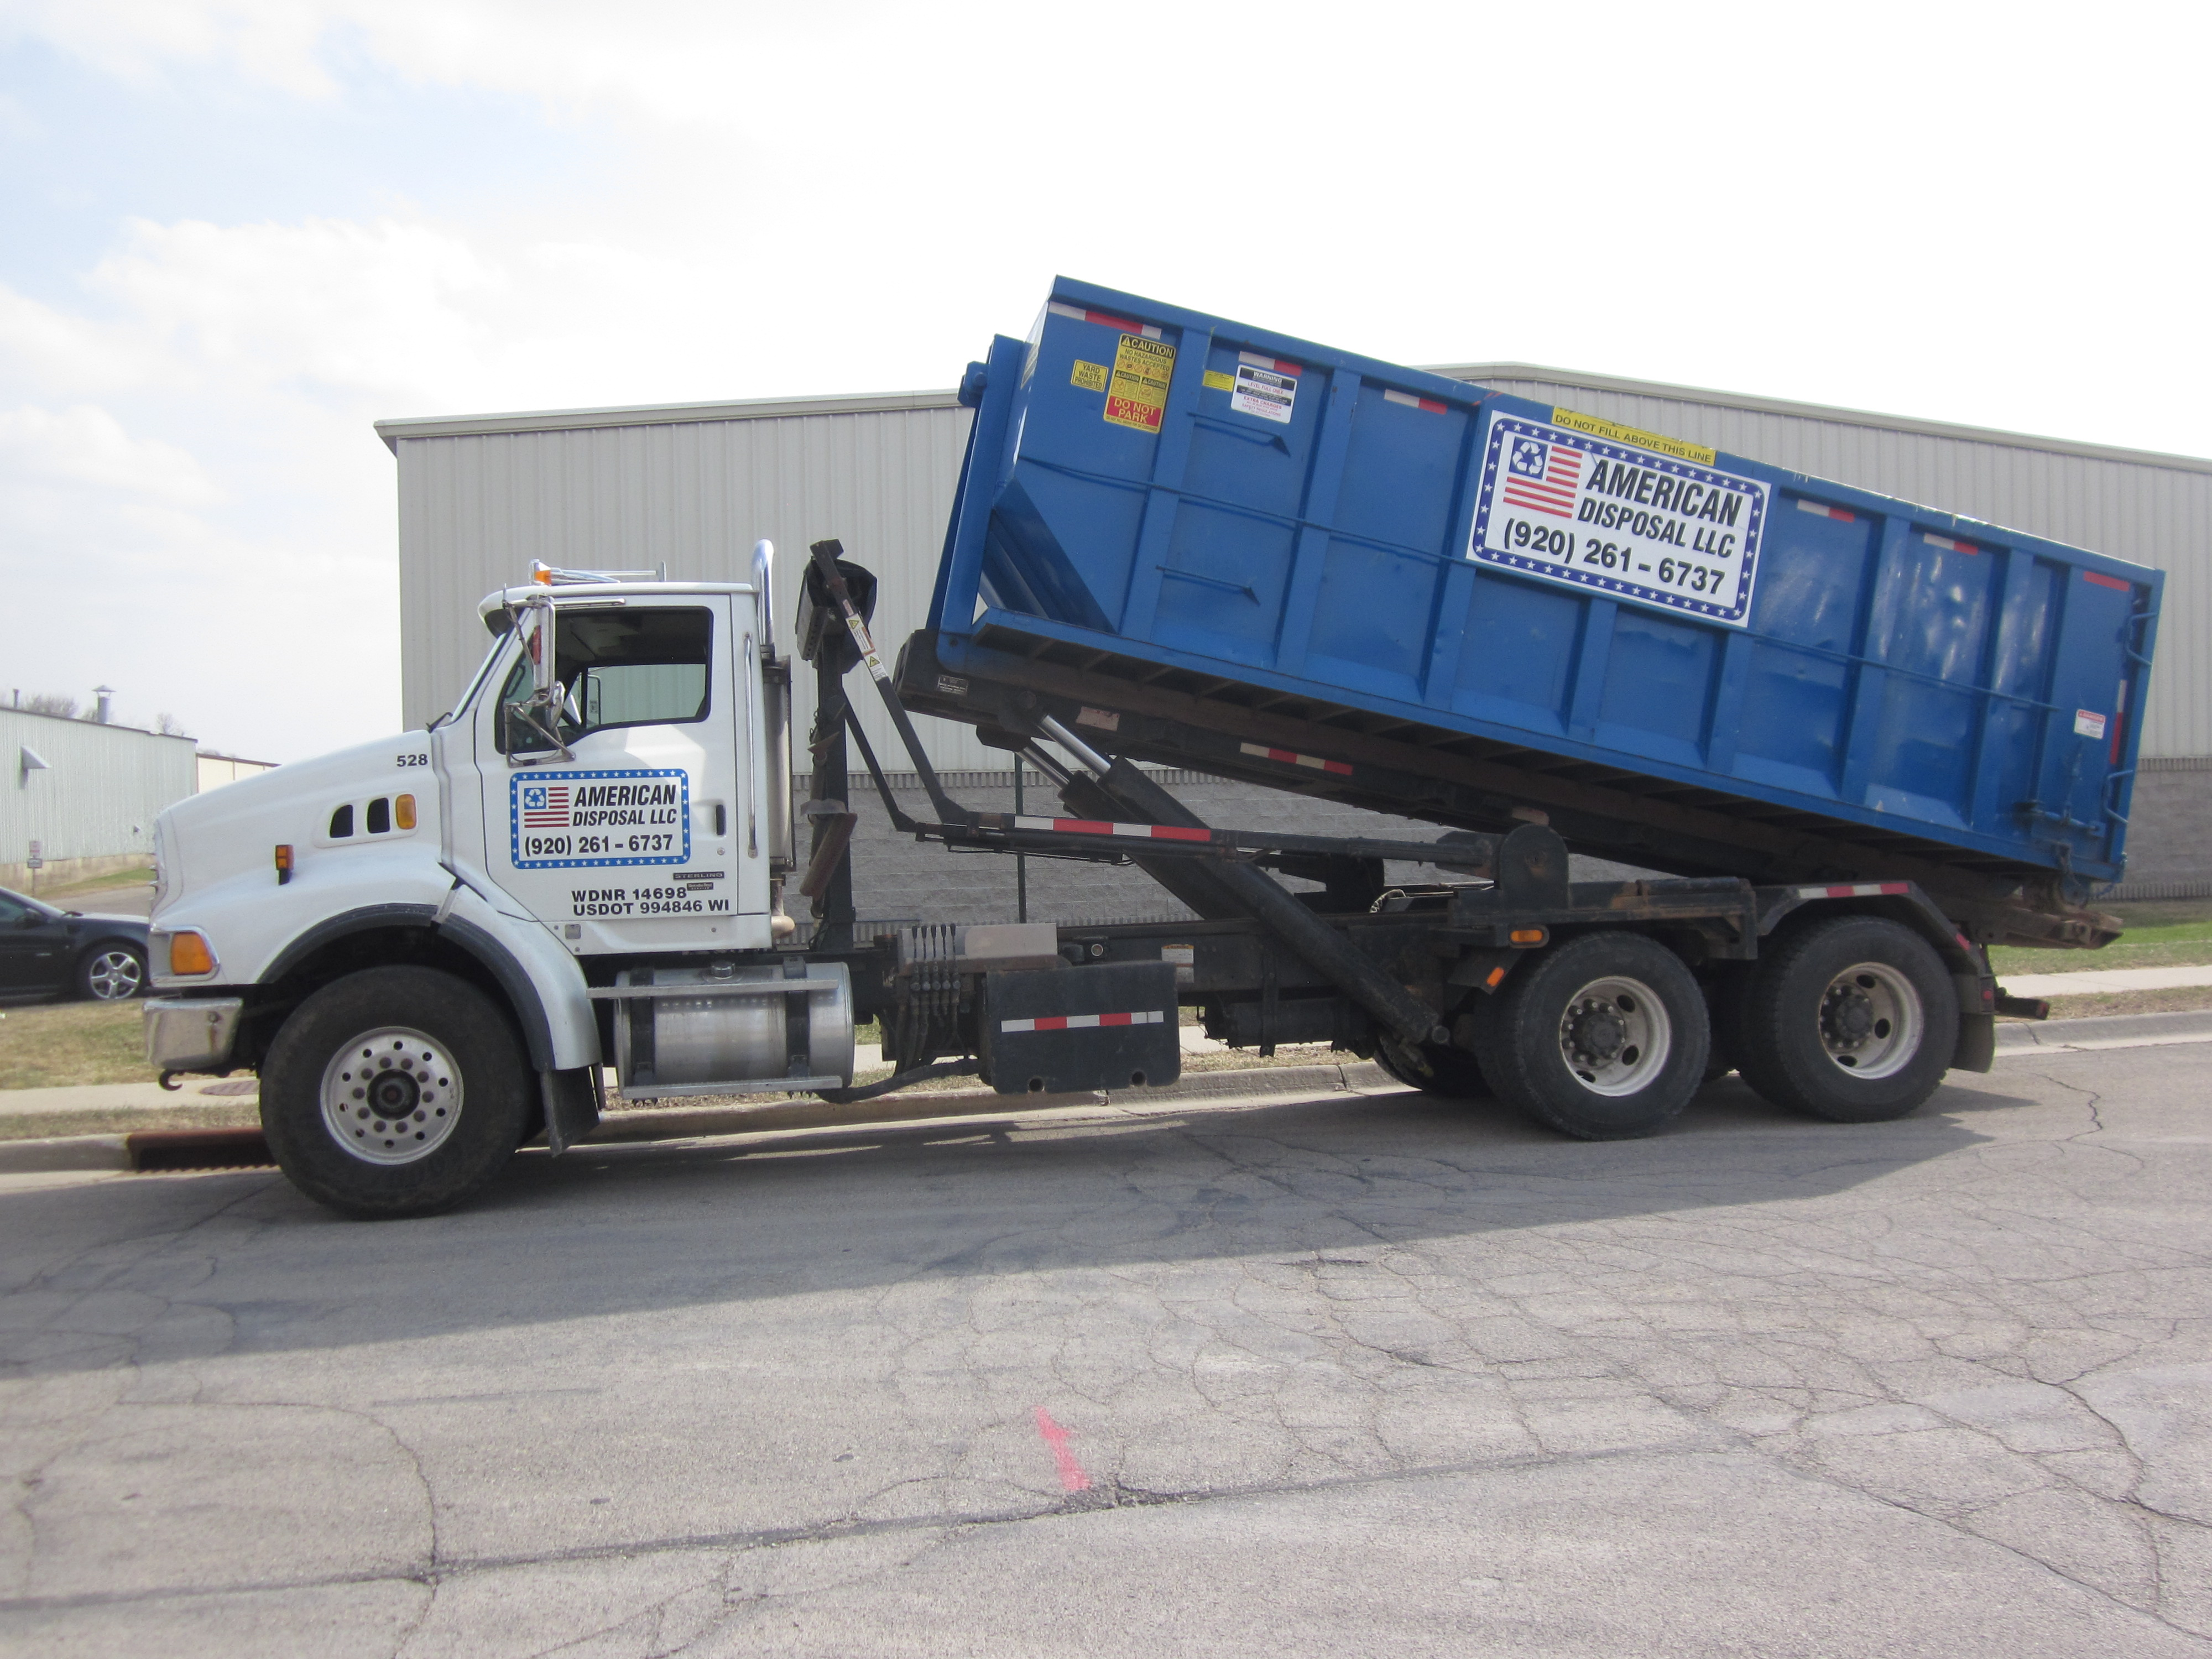 American Disposal LLC - Watertown, WI 53098 - (920)261-6737 | ShowMeLocal.com